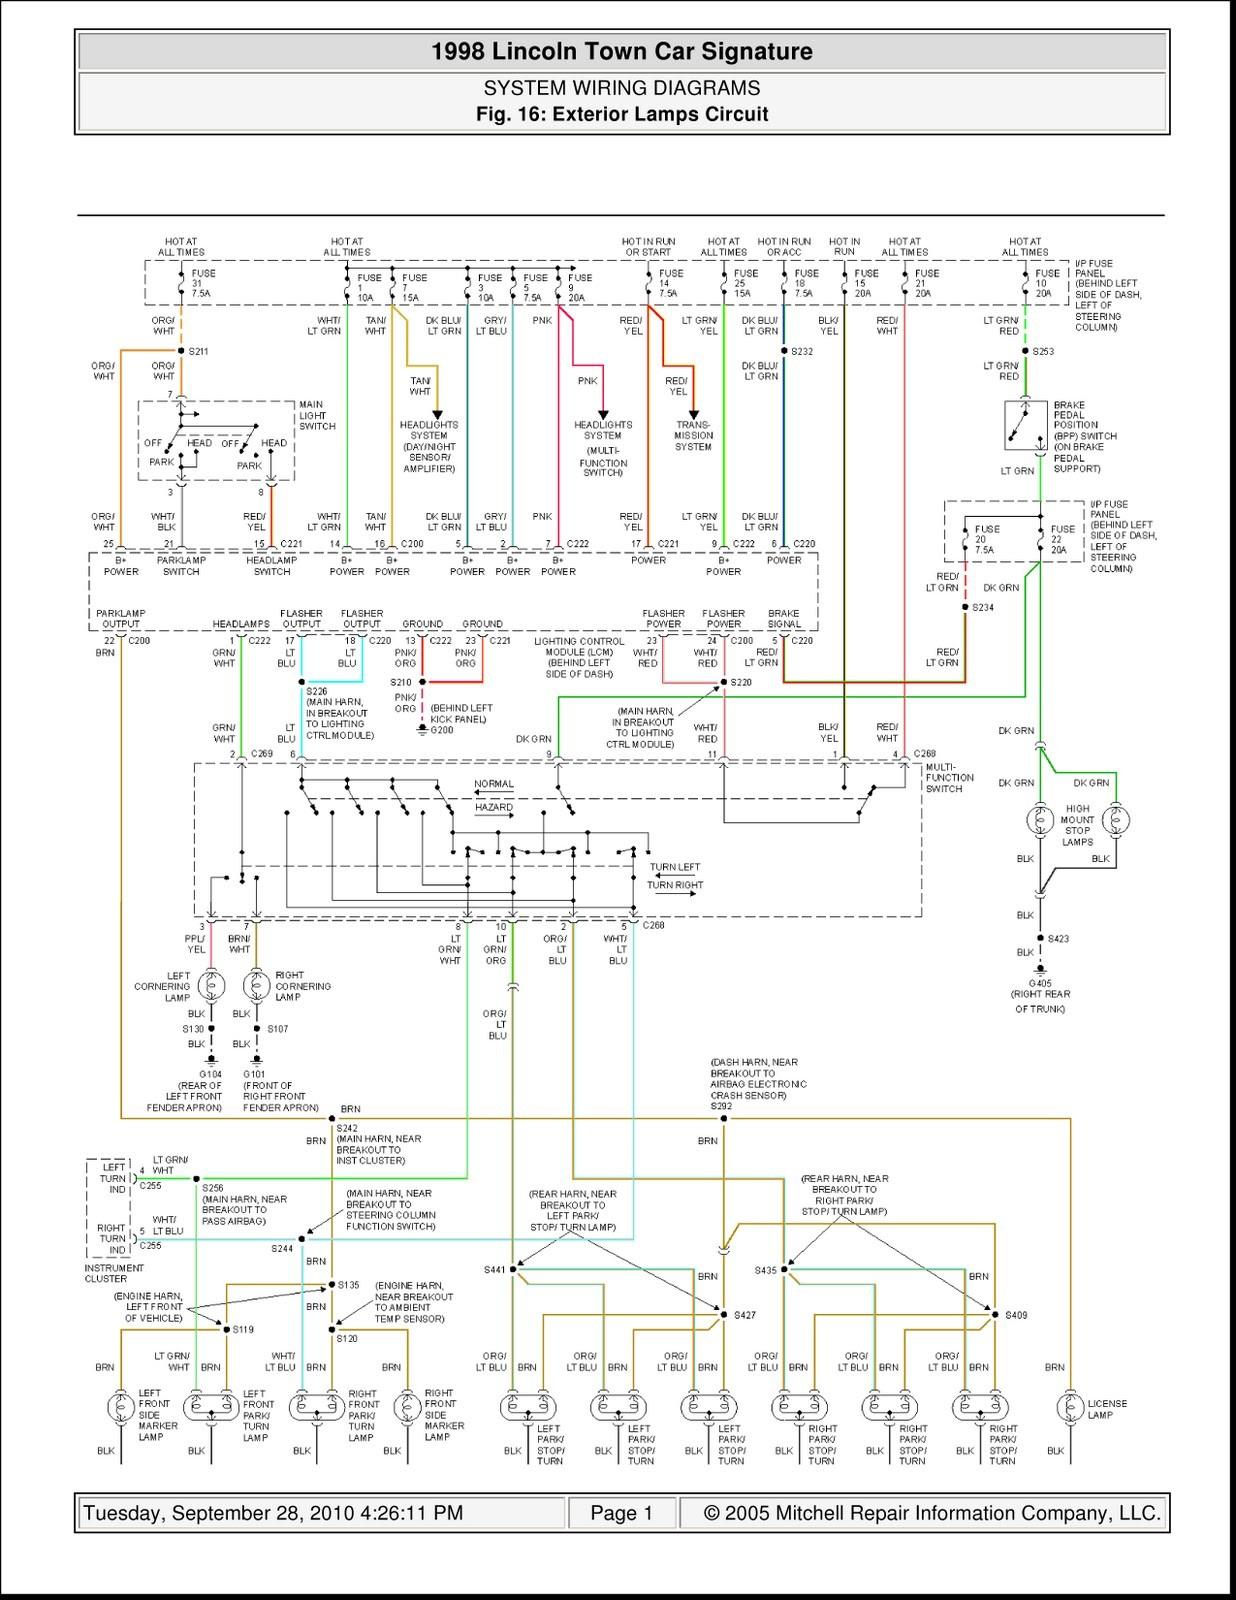 2003 Lincoln Navigator Engine Diagram 2001 Navigator Wiring Diagrams Trusted Wiring Diagram Of 2003 Lincoln Navigator Engine Diagram